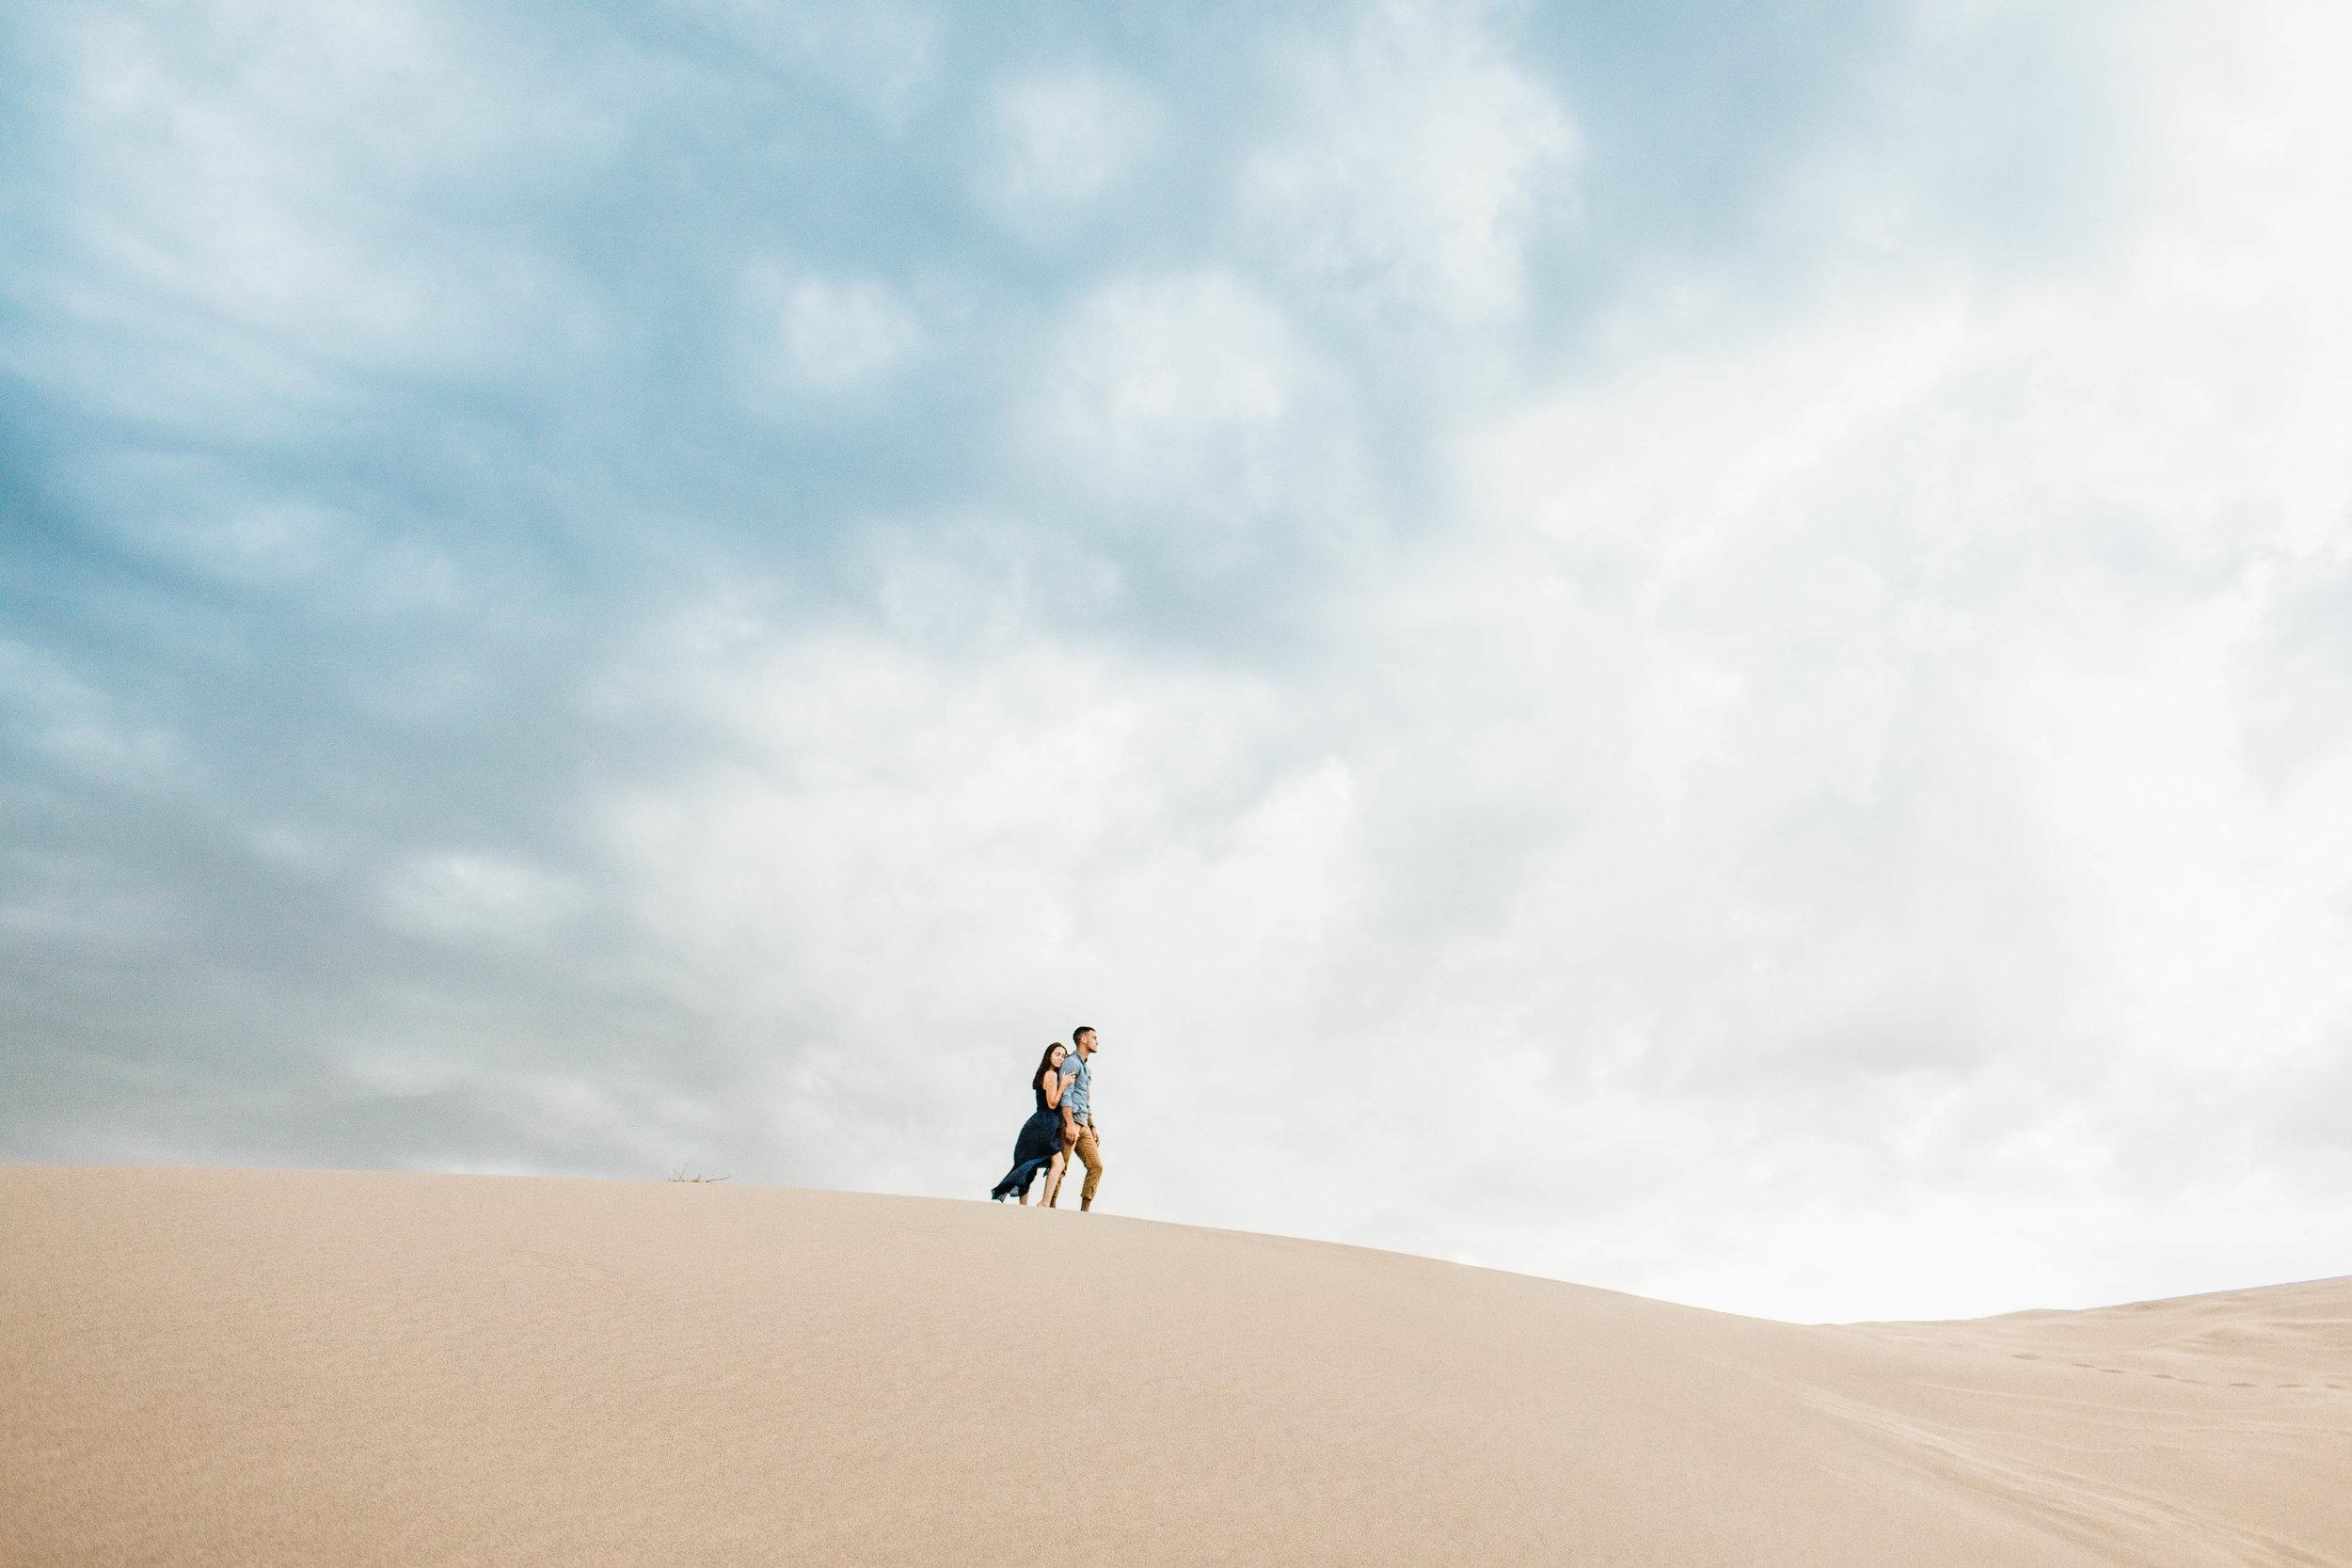 Sheena_Shahangian_Photography_Colorado_Dunes_Boho_Adventure_Couples_Session_Cameron_Bree-48.jpg